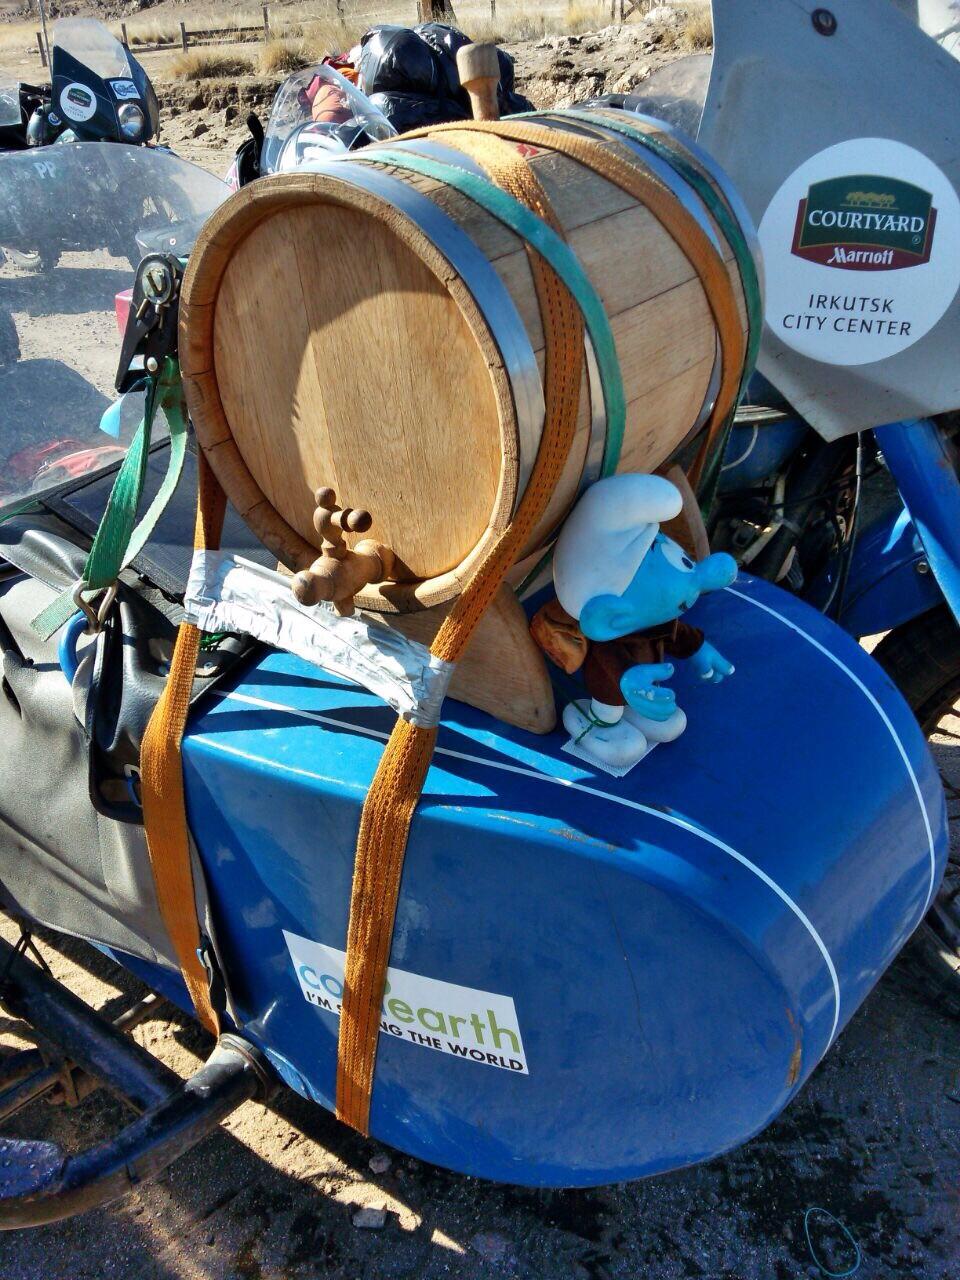 Joe's Bar - Whiskey barrel sidecar mount